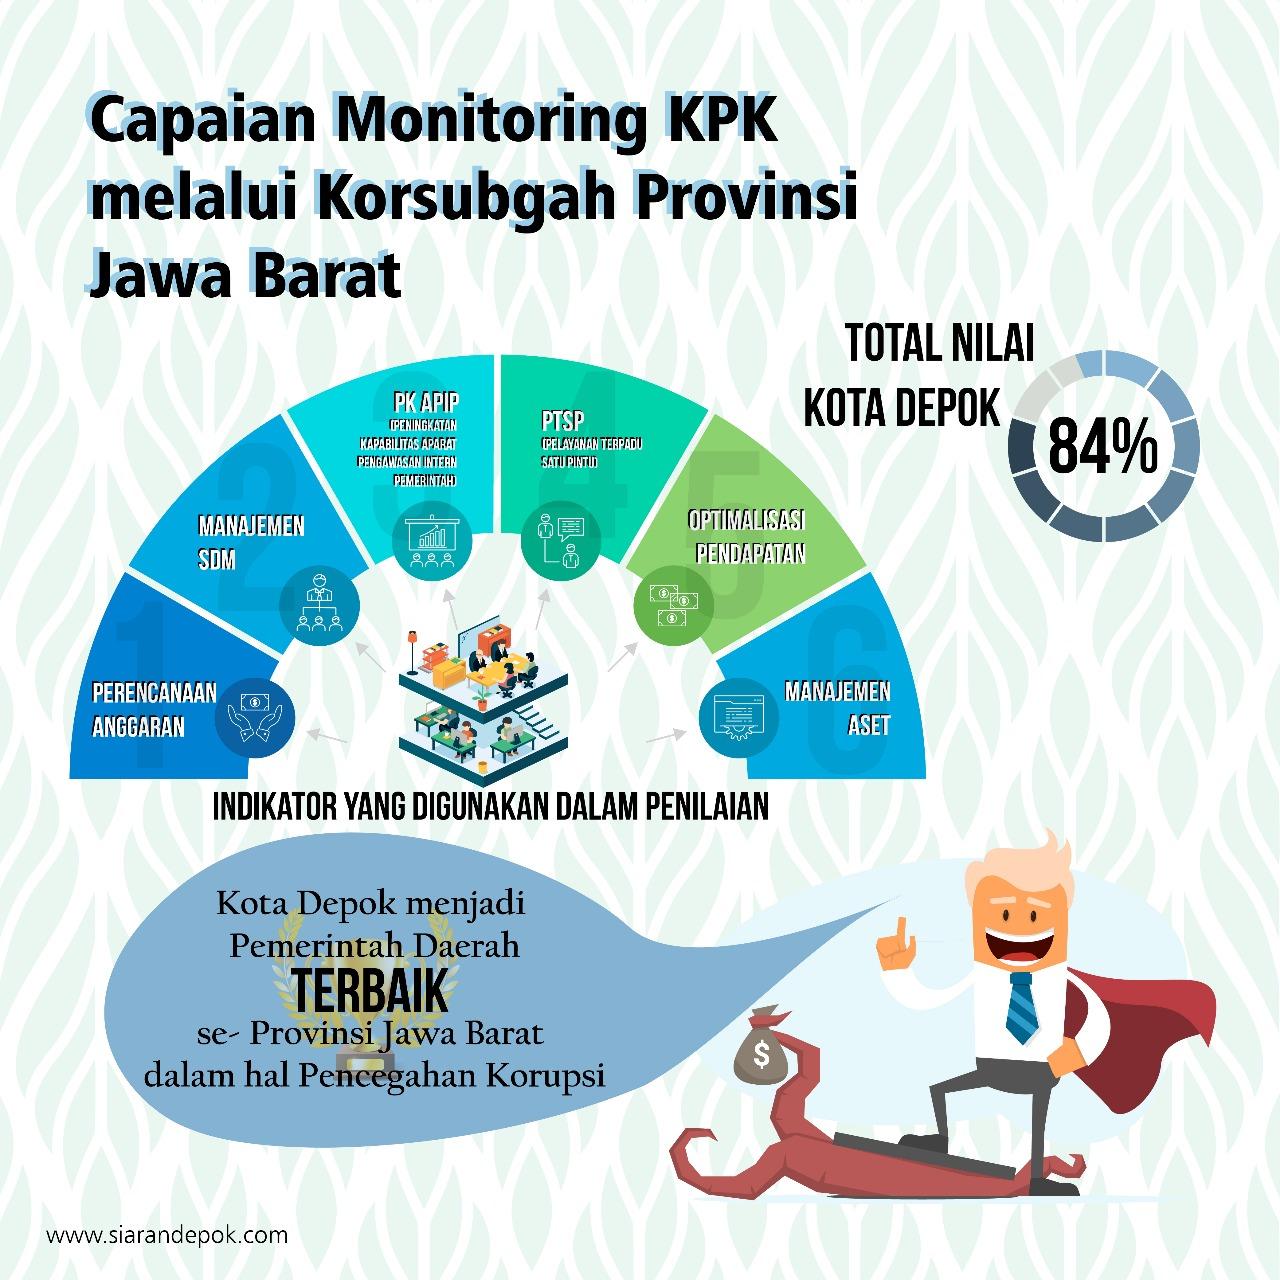 KPK Nilai Kota Depok Terbaik Se-Jawa Barat Dalam Pencegahan Korupsi